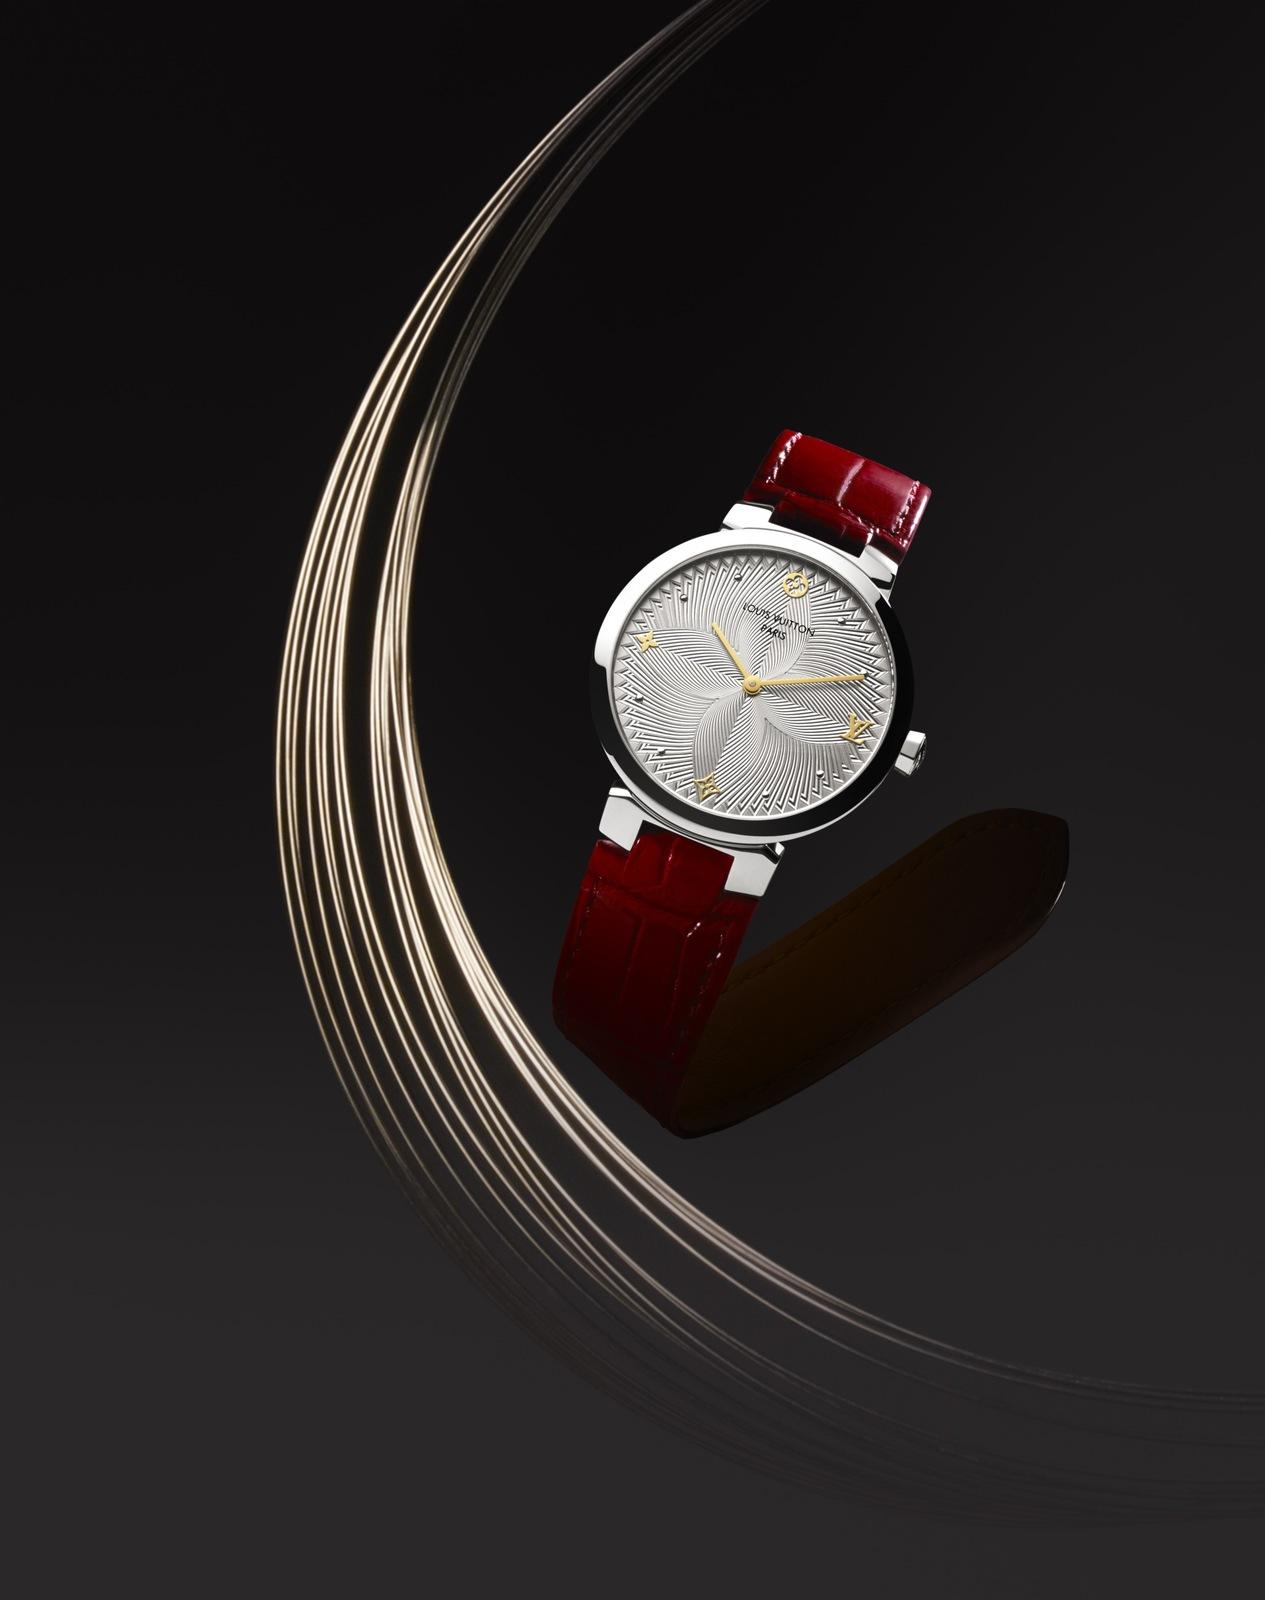 Nové hodinky Tambour Slim a jiné dárky od Louis Vuitton  6b303aa370b